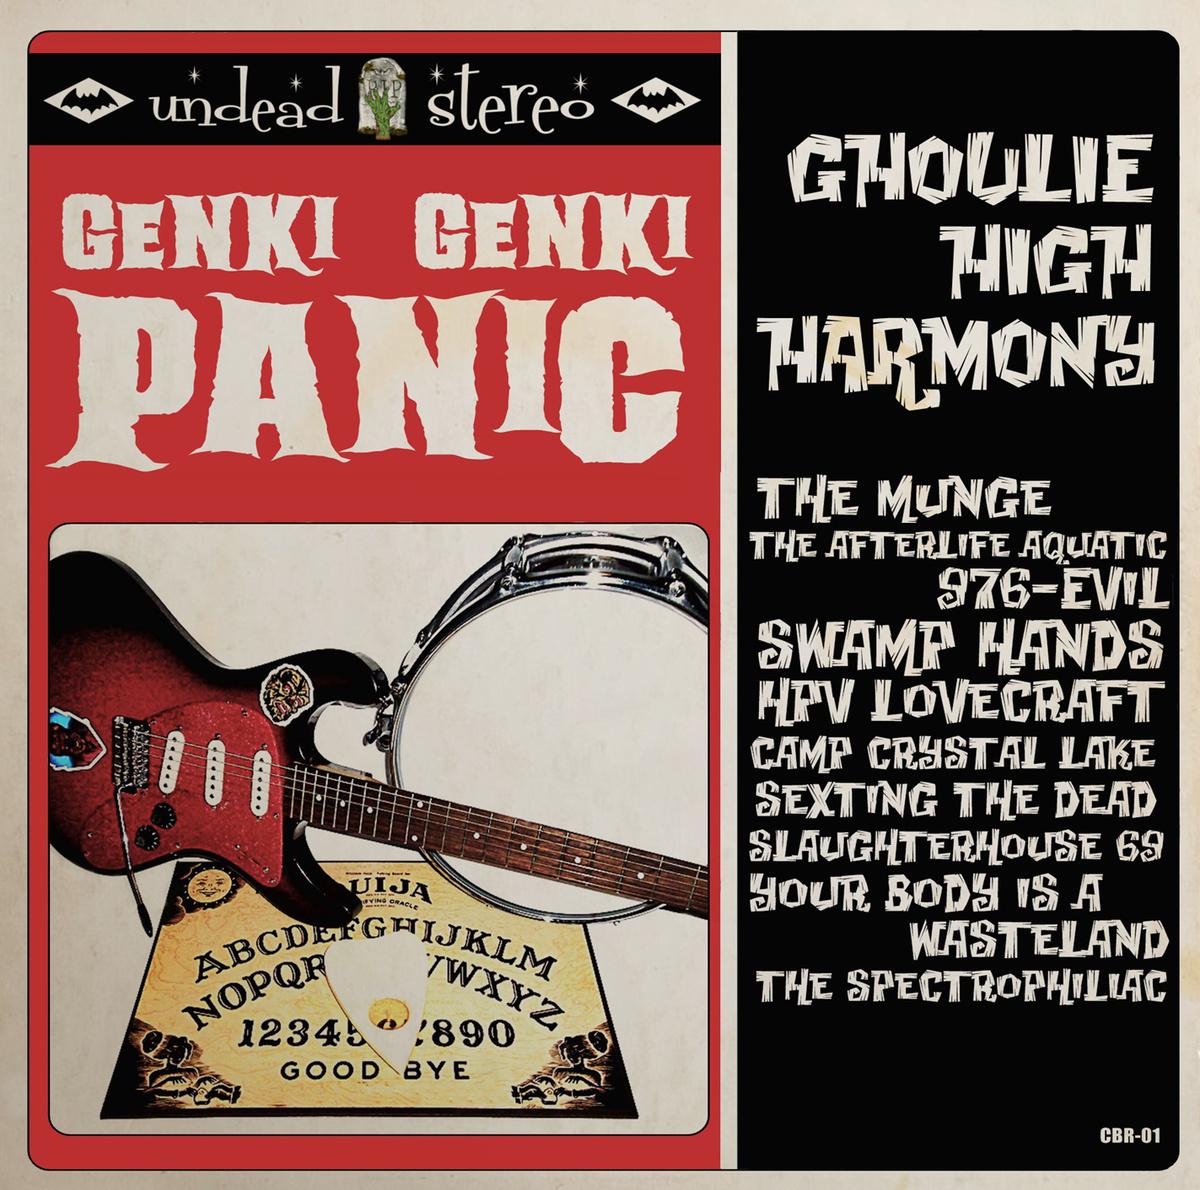 Genki Genki Panic - Ghoulie High Harmony